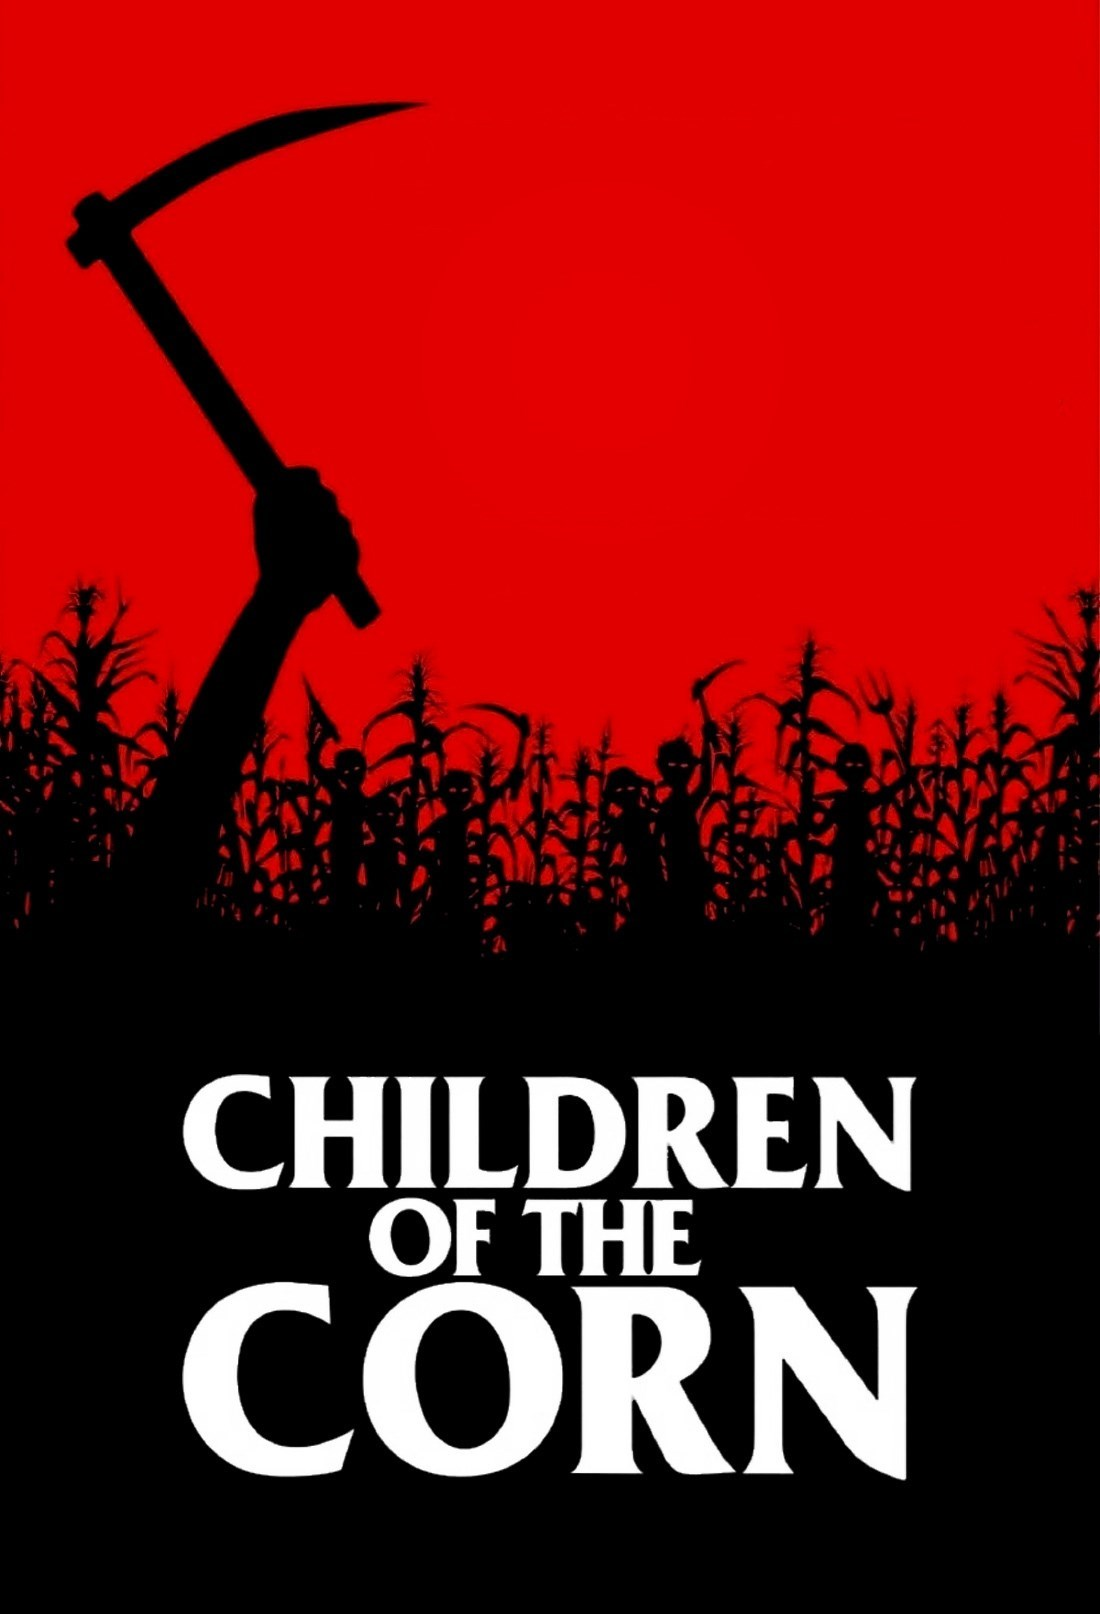 children-of-the-corn.26673